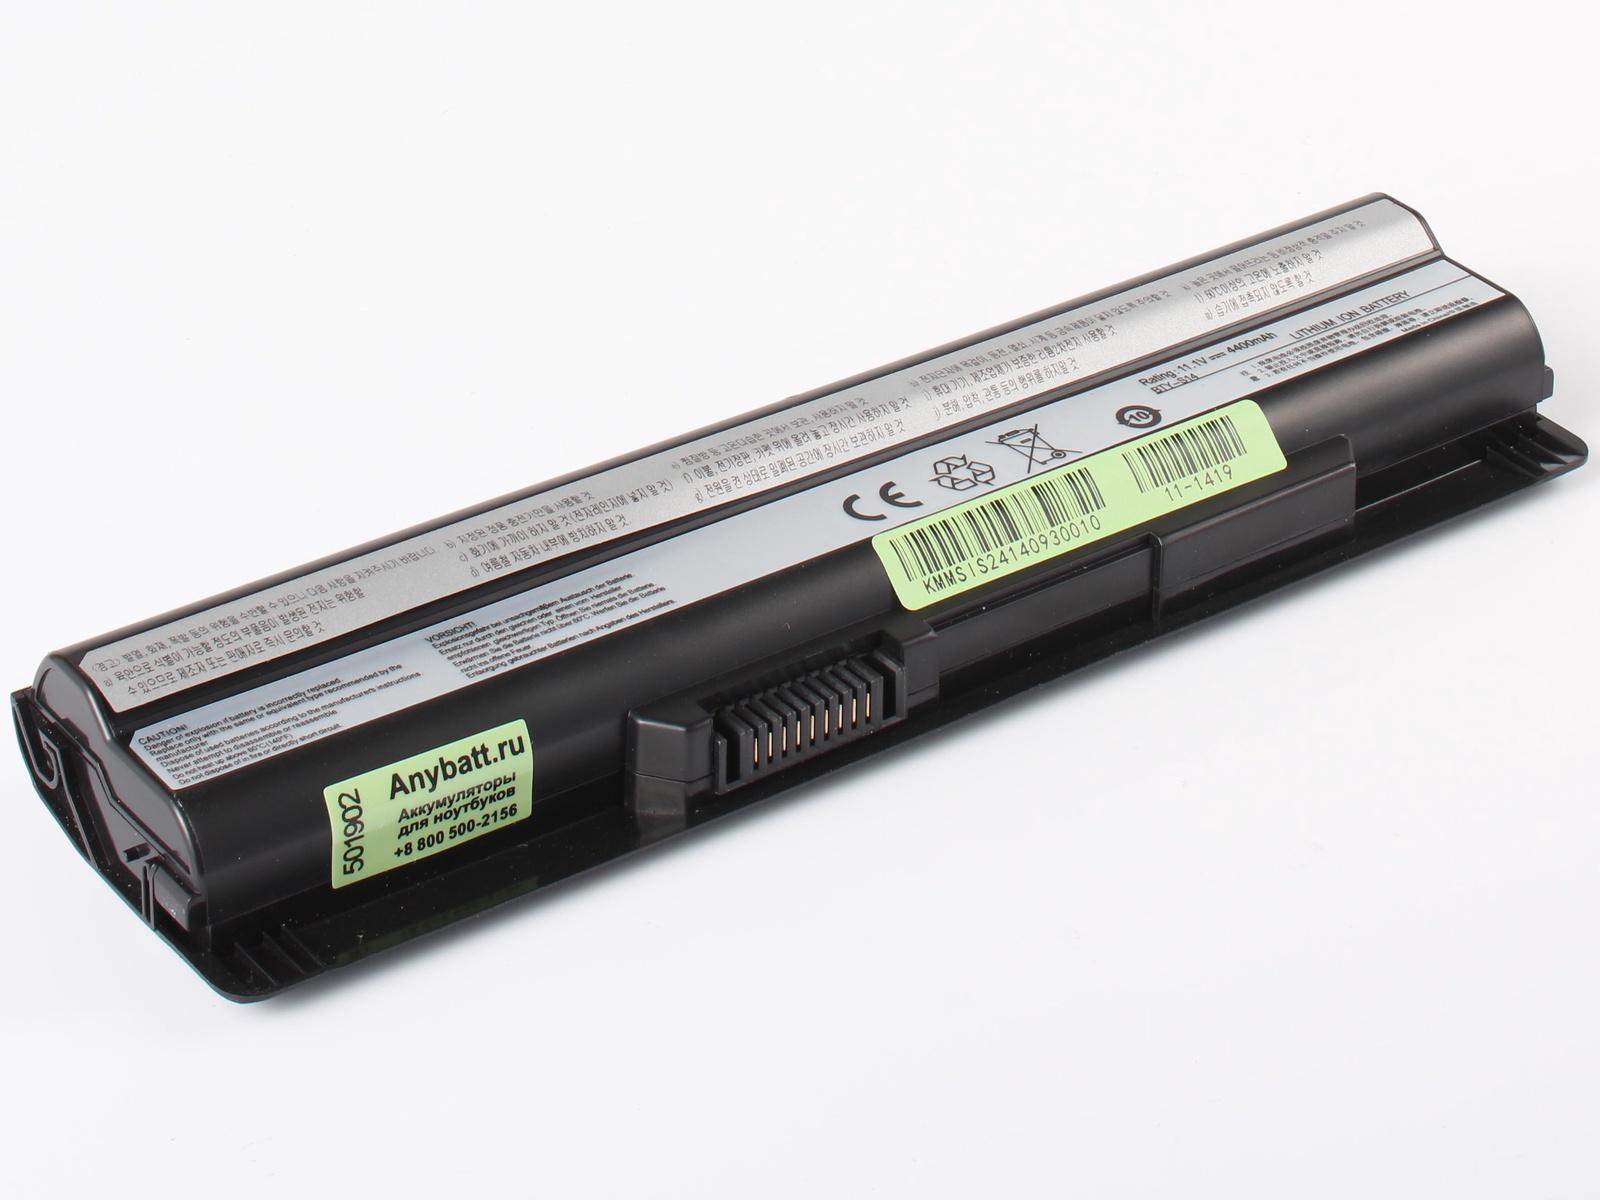 Аккумулятор для ноутбука AnyBatt для MSI FR603, GE60 0NC-026, GE70 0ND-216, CX61 0OD-636, GE60 2OD, CX61 0OL, GP60 2QE, Megabook CR650, CX61 2OC-249RU, GE70 0ND-415, GE620DX-615X, GP60 2QE Leopard, CX61 0NF, GE620DX-831, CX70 2OC аккумулятор для ноутбука anybatt для msi ms 16g4 ge60 2pf fx620dx gp70 2od ge70 2od cr70 2m cx61 0nc fx610mx ge60 2qe cx70 0nd gp70 2qe fr400 fr610 ge70 2qd cx70 0nf 210 gp70 2qe leopard cx61 2oc ge60 0nd 478